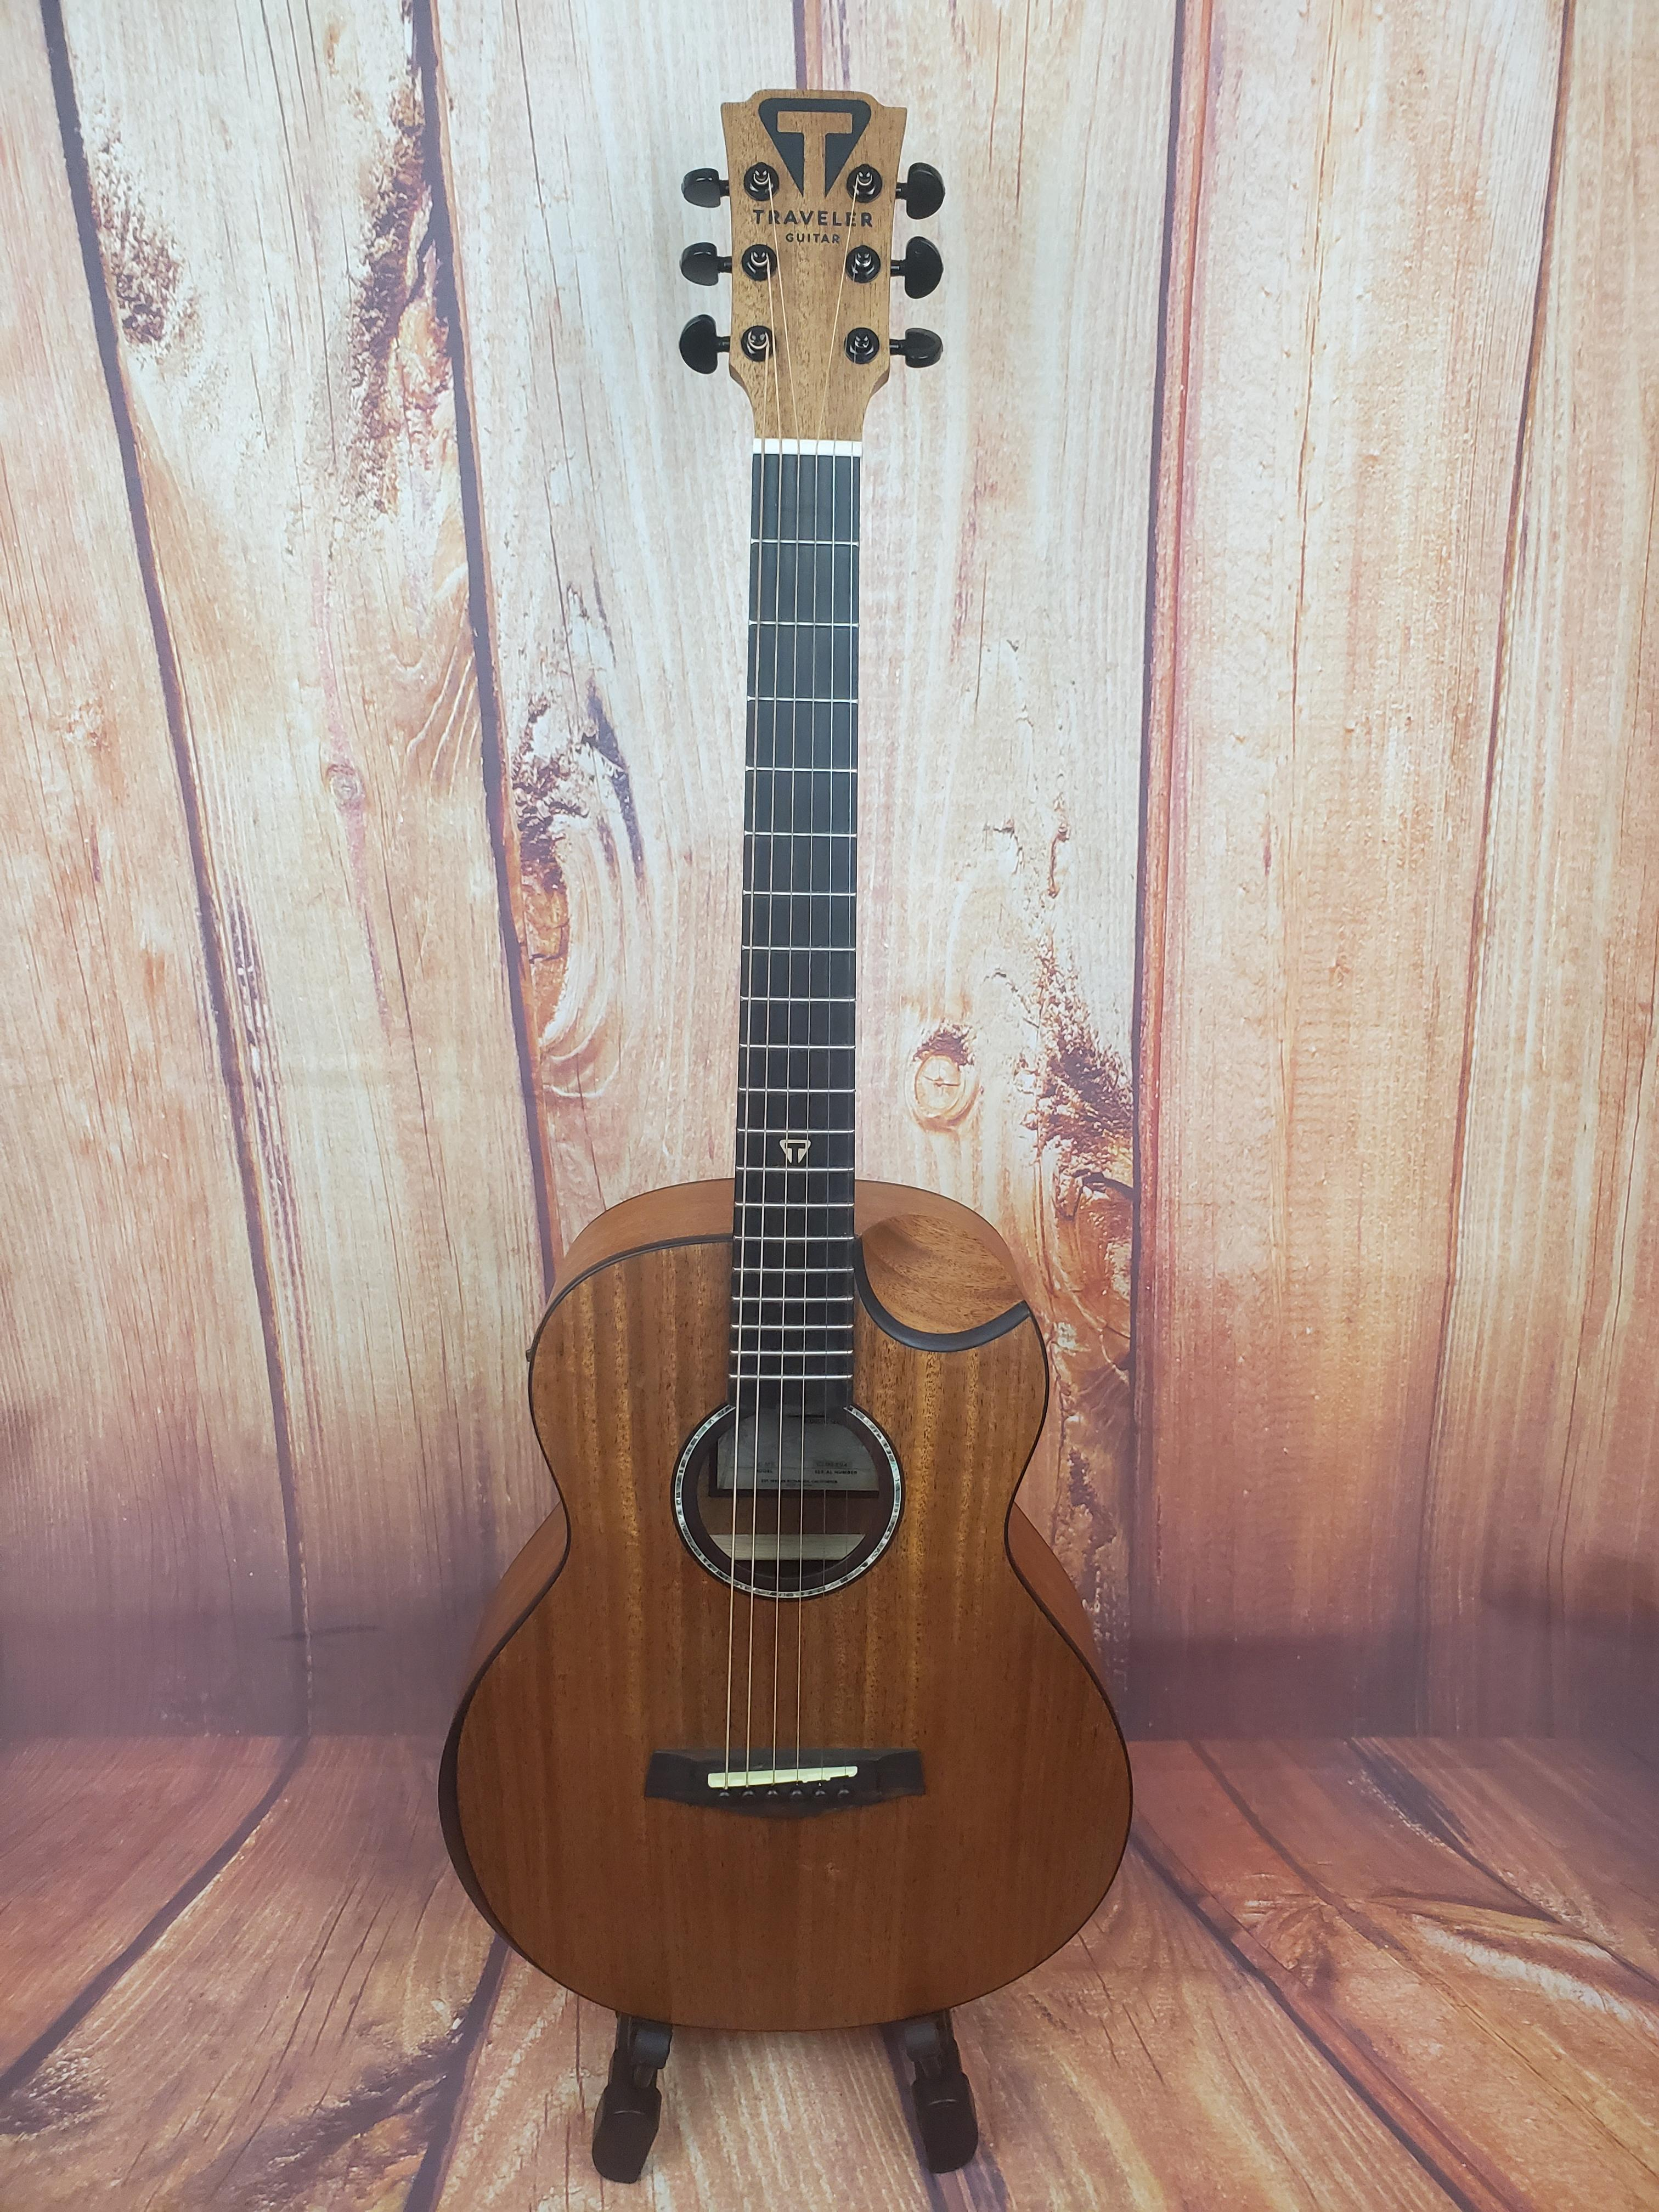 Used- Traveler Guitar Redlands Concert Acoustic-Electric Guitar - Natural Mahogany